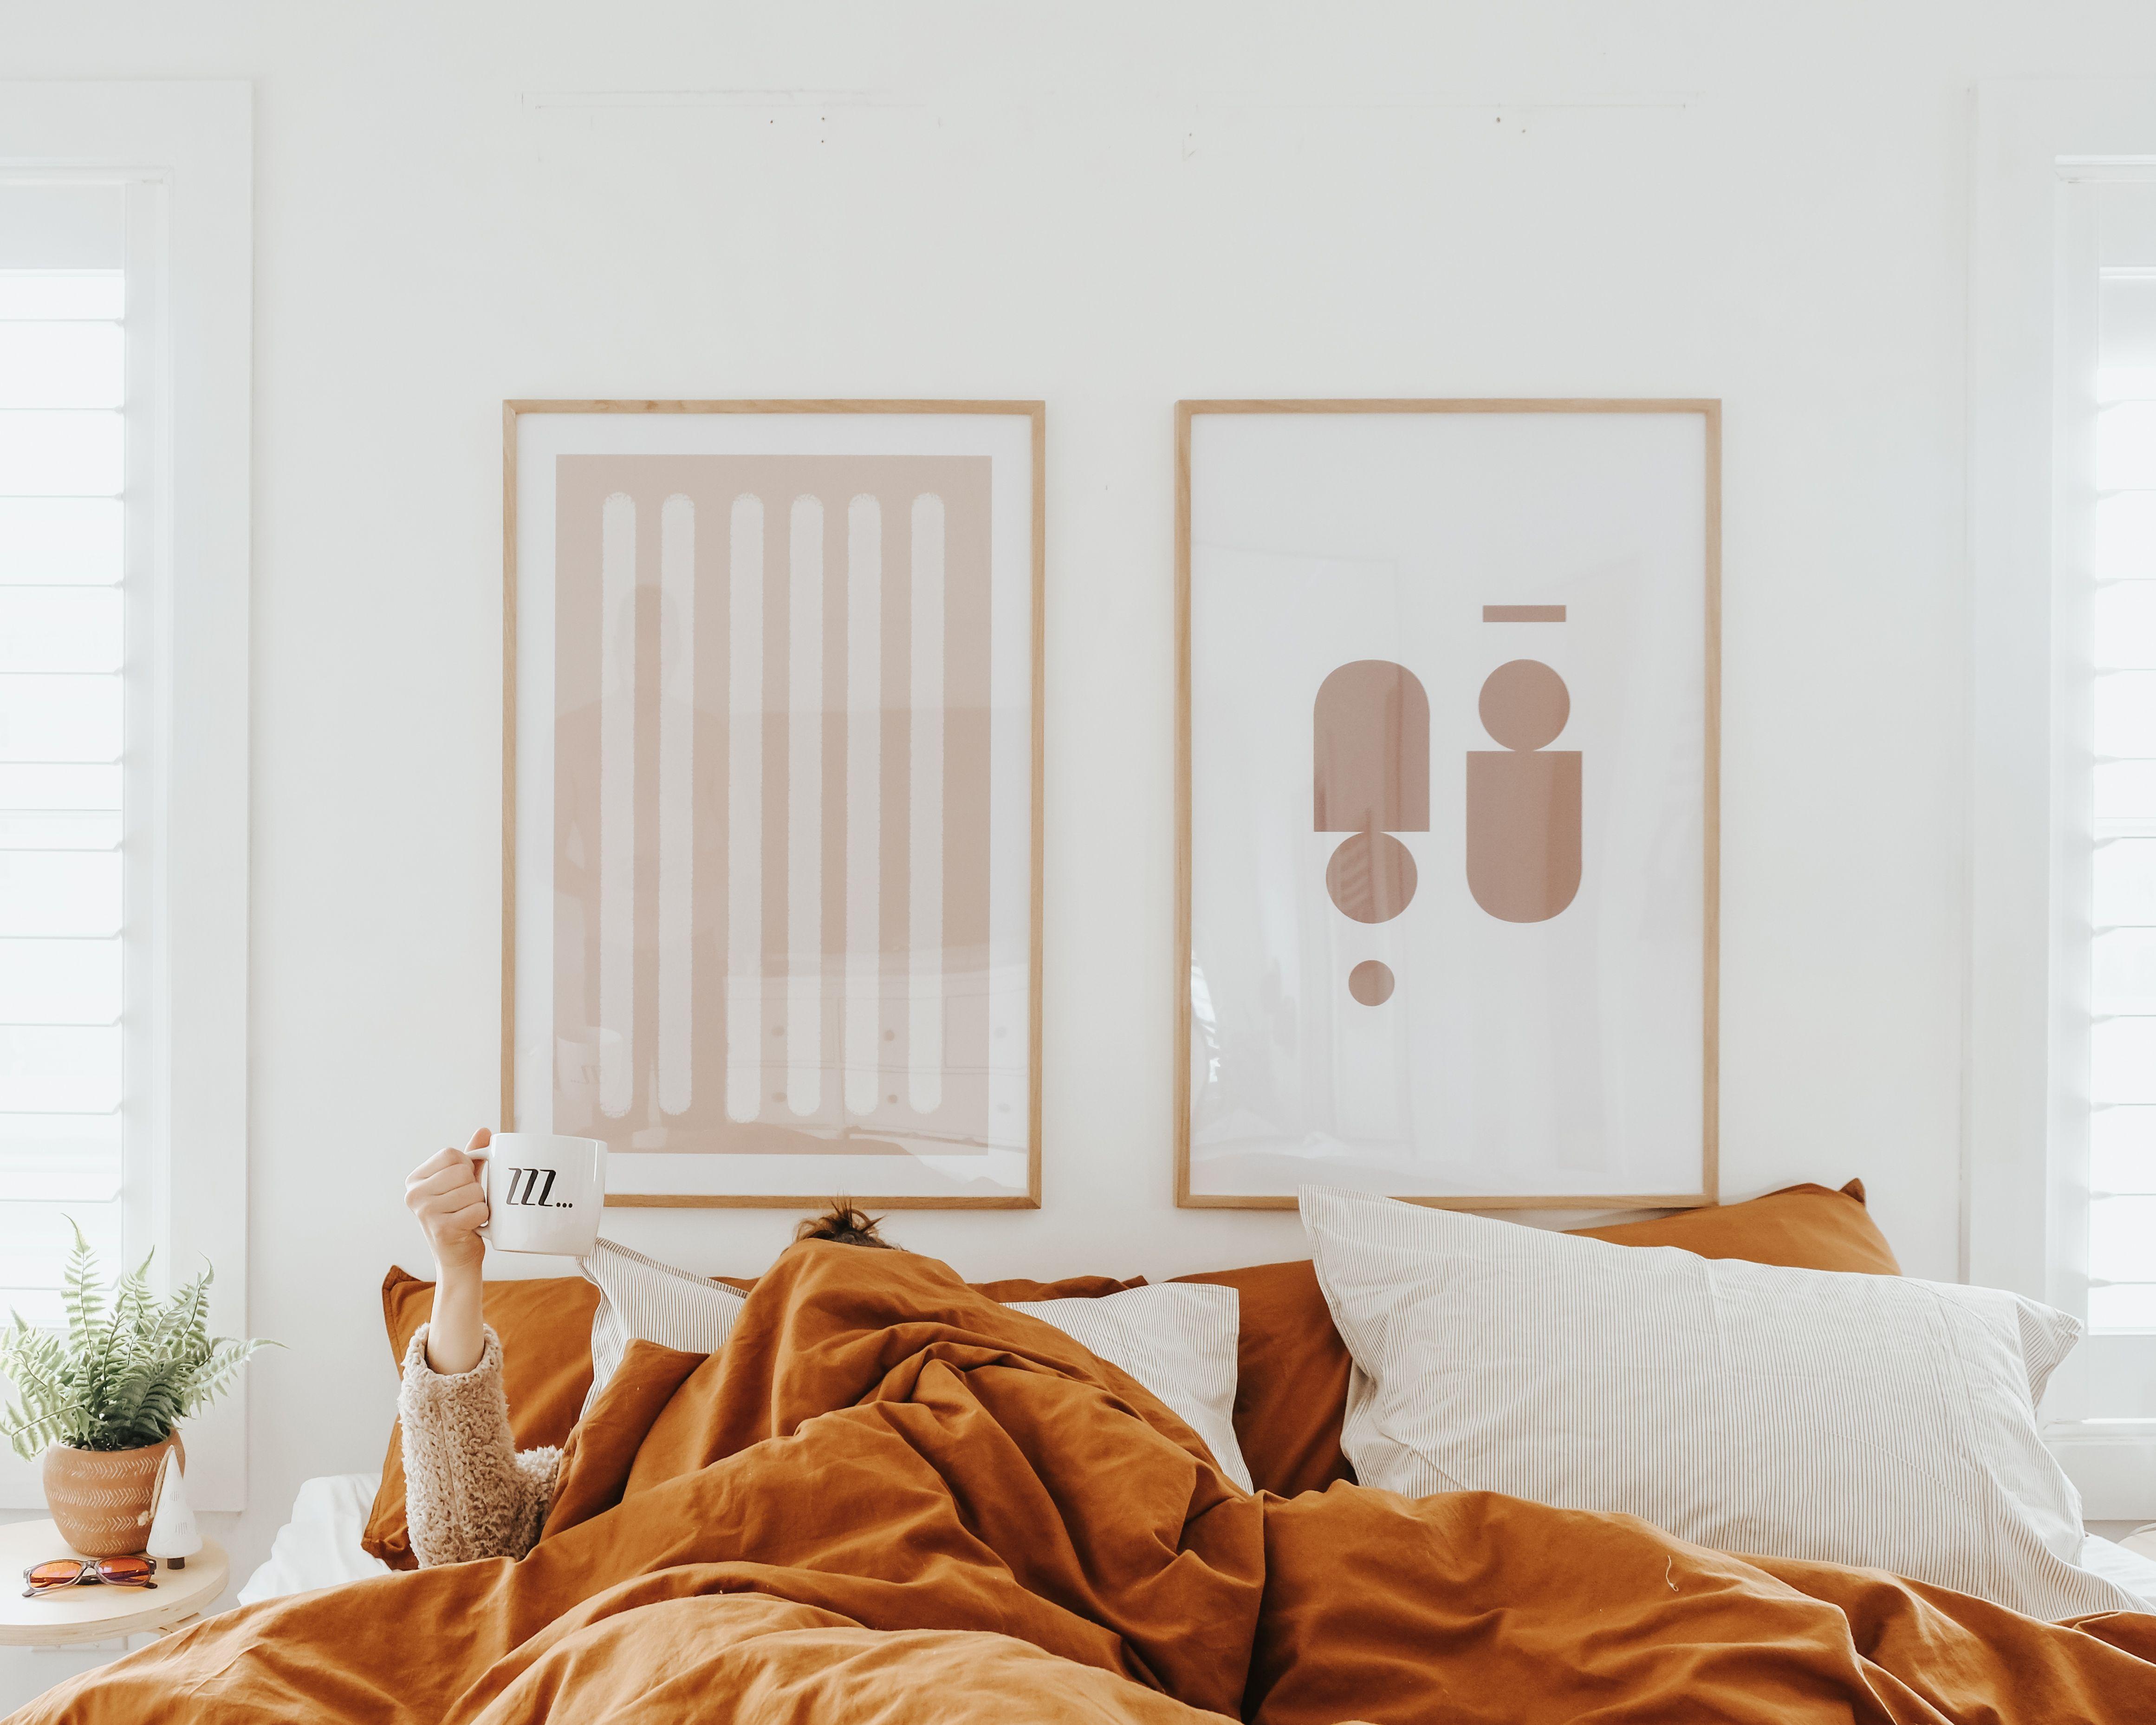 Sleep Number Site Smart bed, Kid beds, Adjustable beds